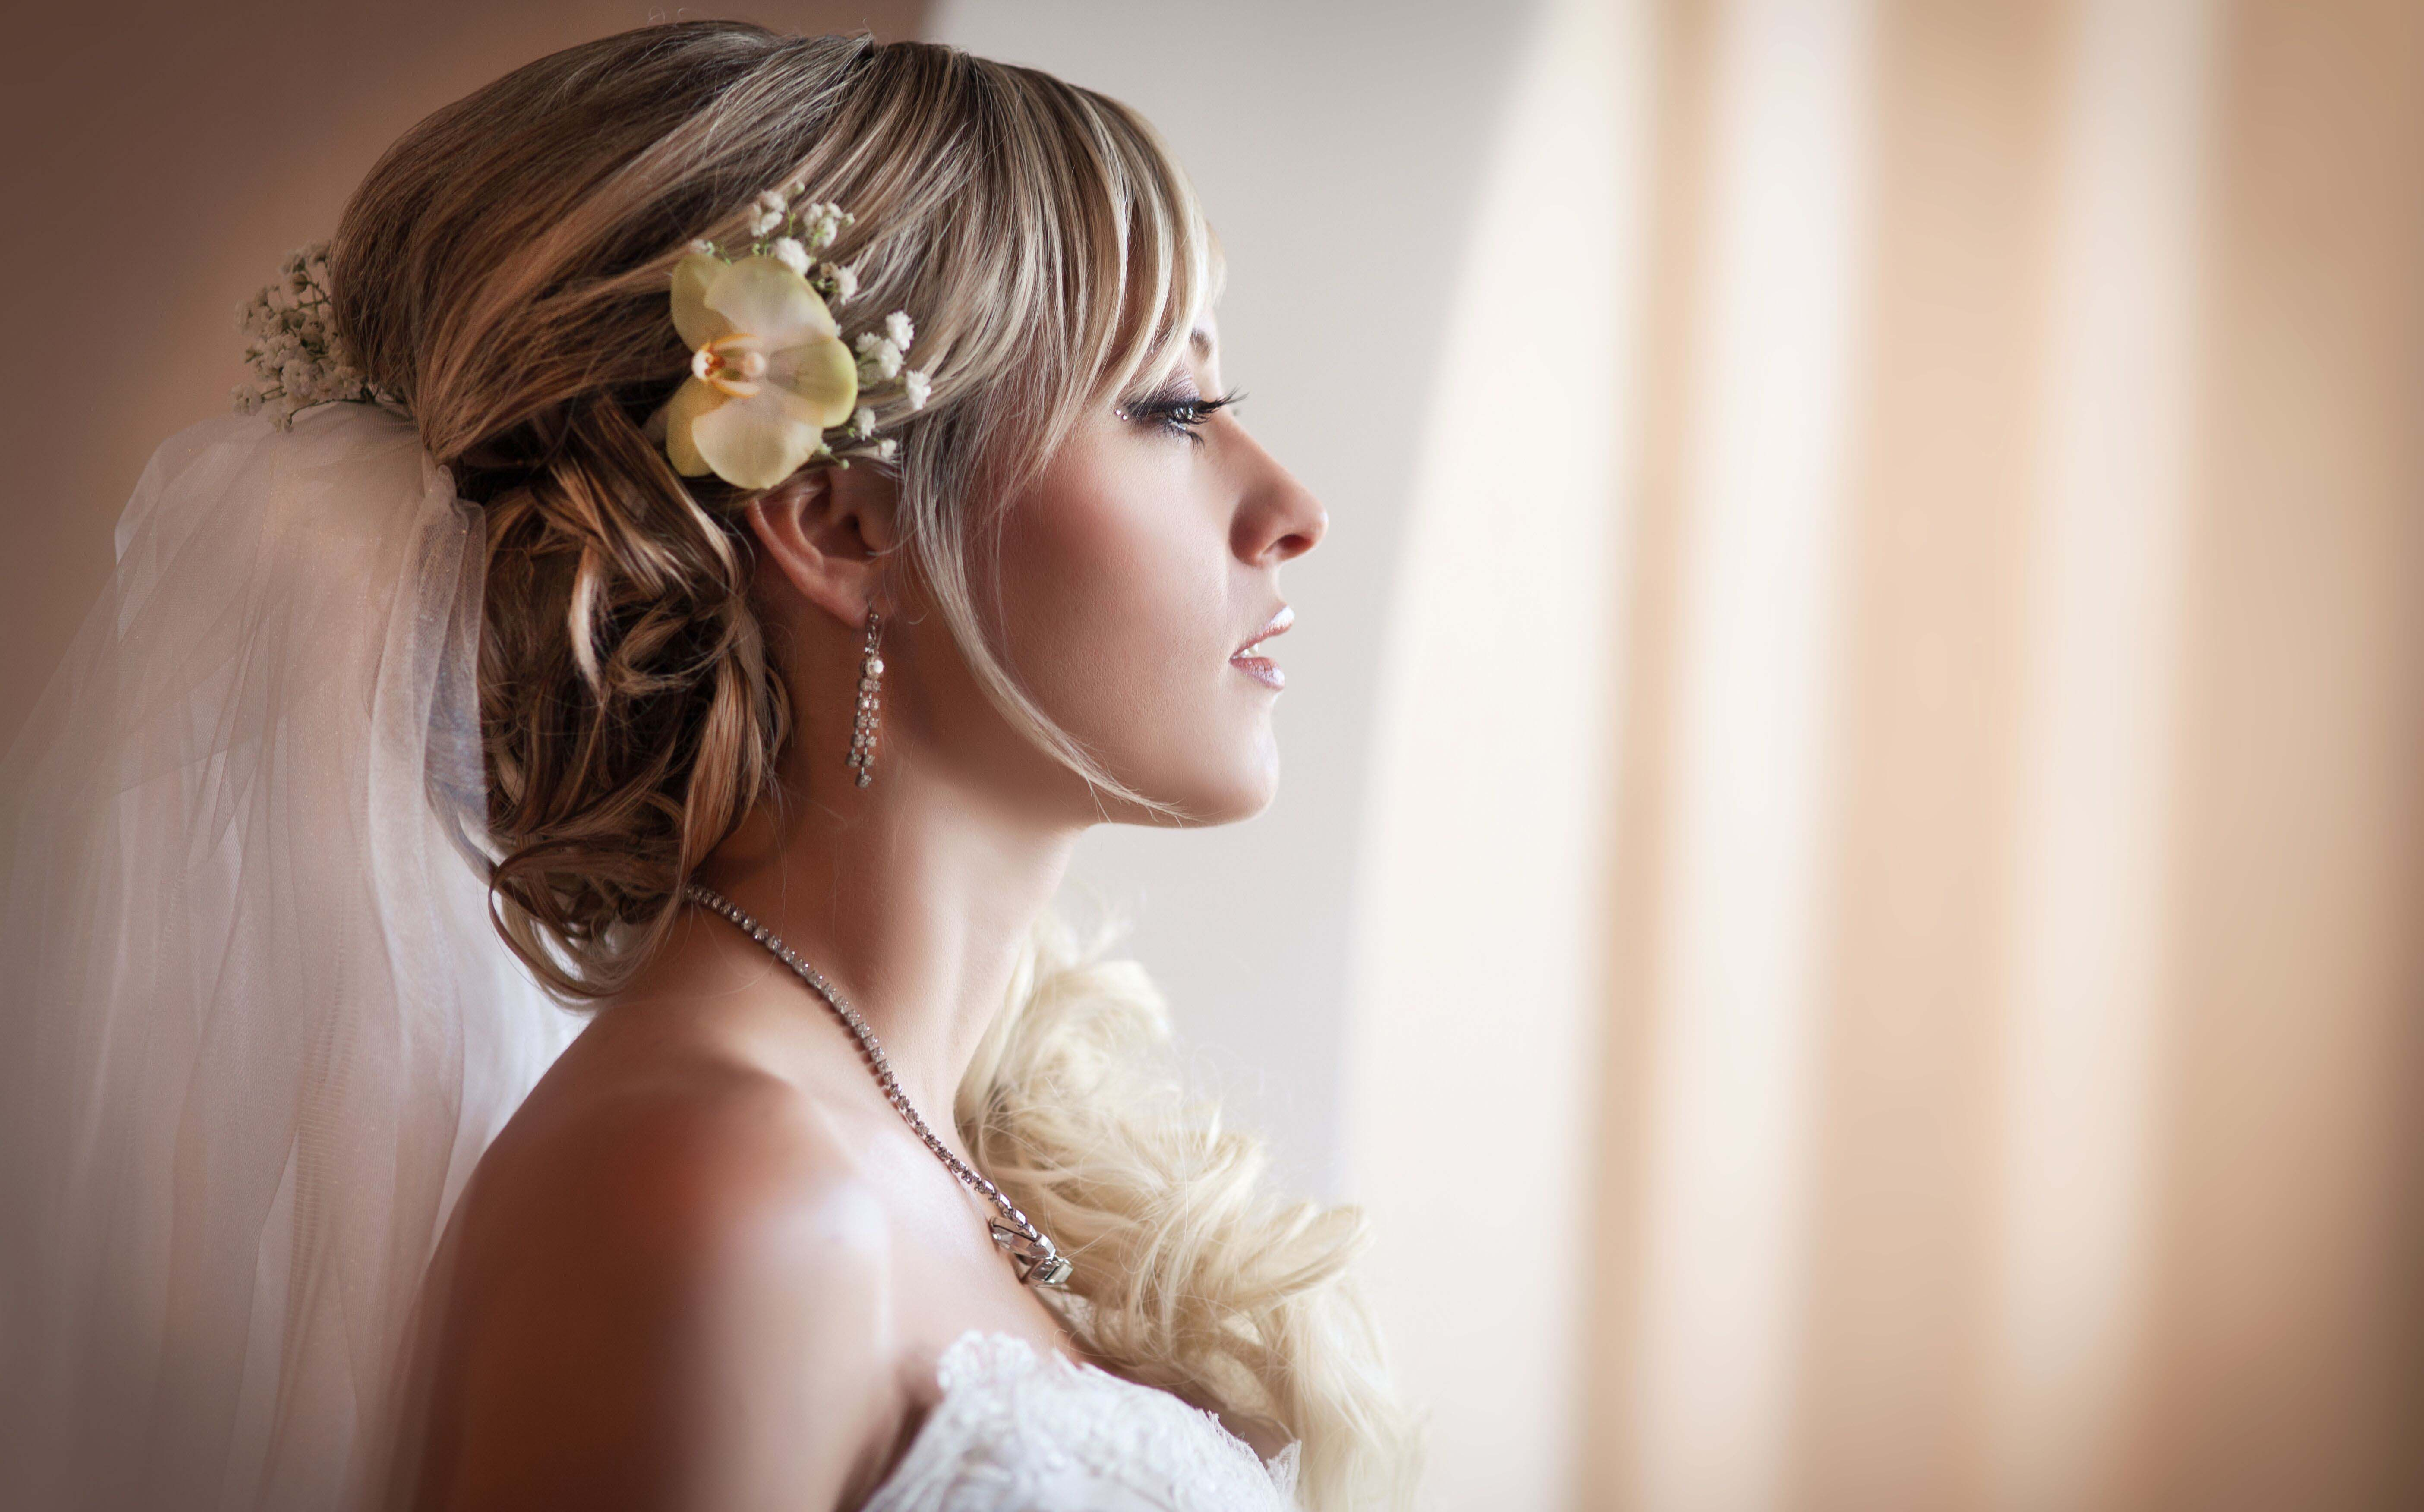 capelli-sposa-zephir-parrucchieri-ascona-muralto